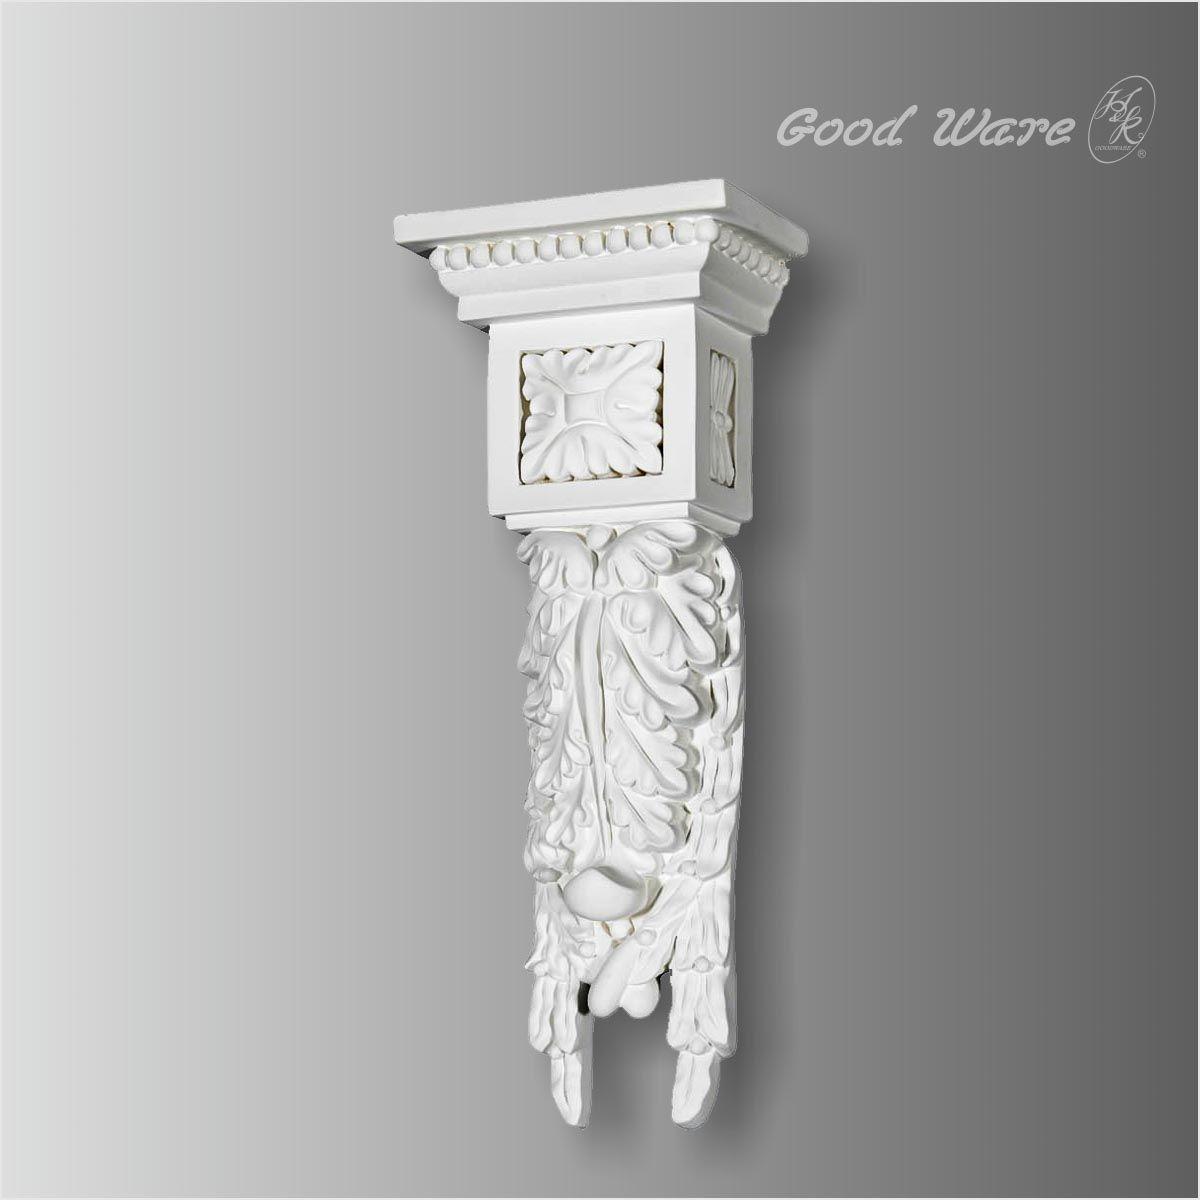 motif awesome decorative corbels dochista embellishment decor amazing ideas wall art info